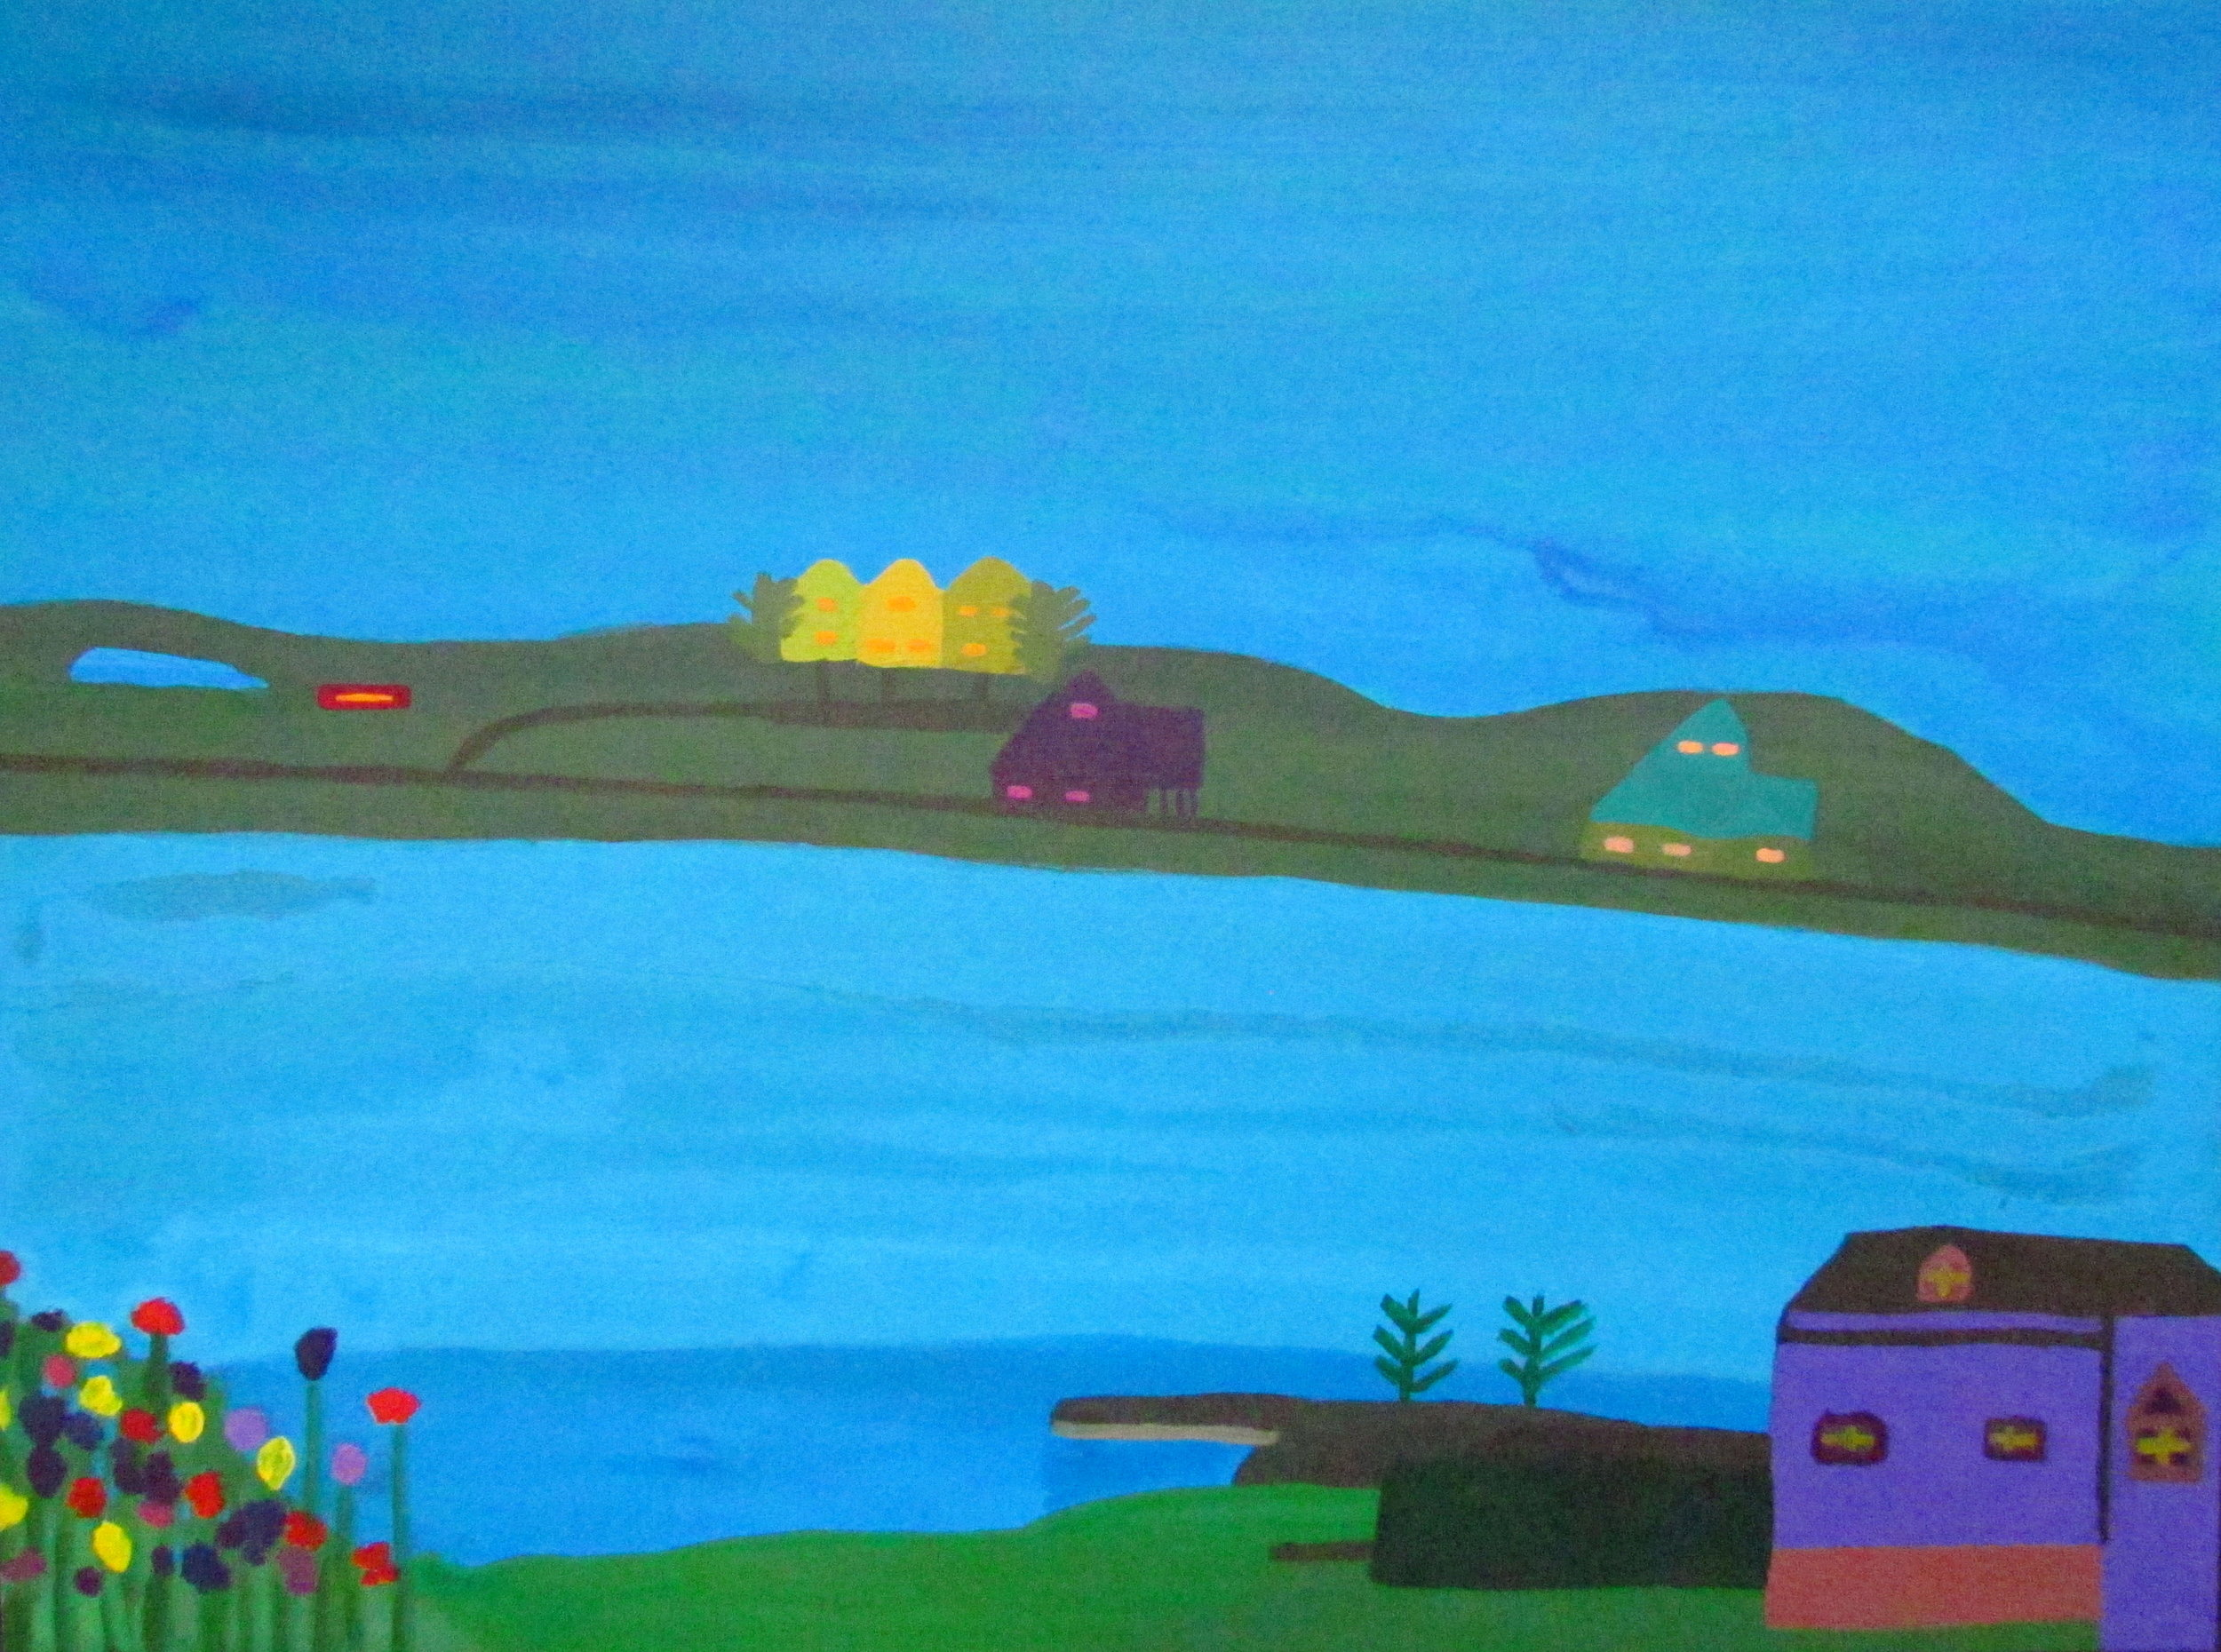 9 2016 Houses around lake, Acrylic on canvas, 76 X 101cm, Yaniv Janson1.JPG